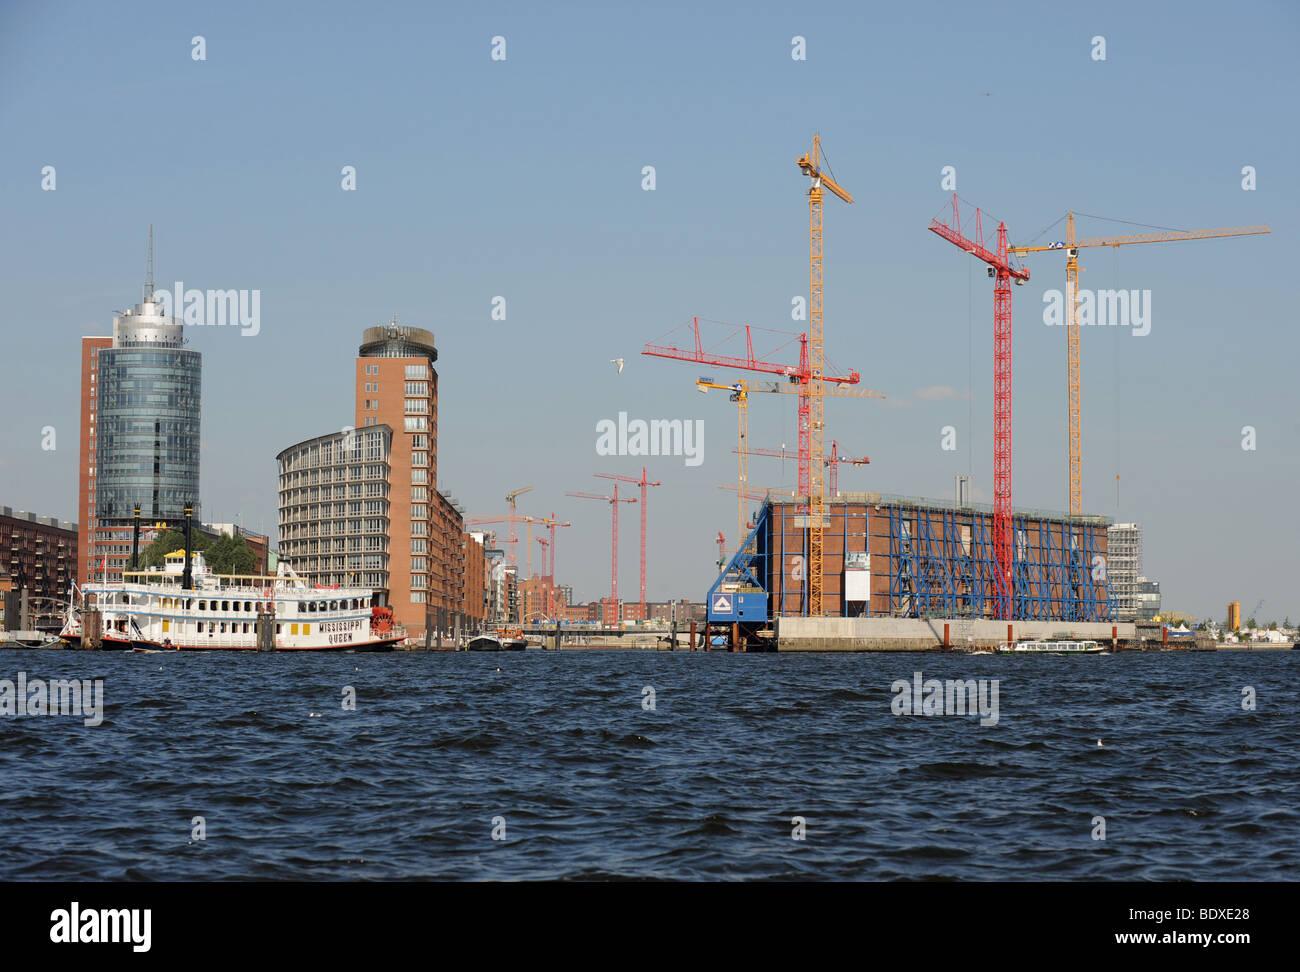 Elbphilharmonie under construction in the harbor /Hafencity of Hamburg, Germany, July 30, 2008. - Stock Image